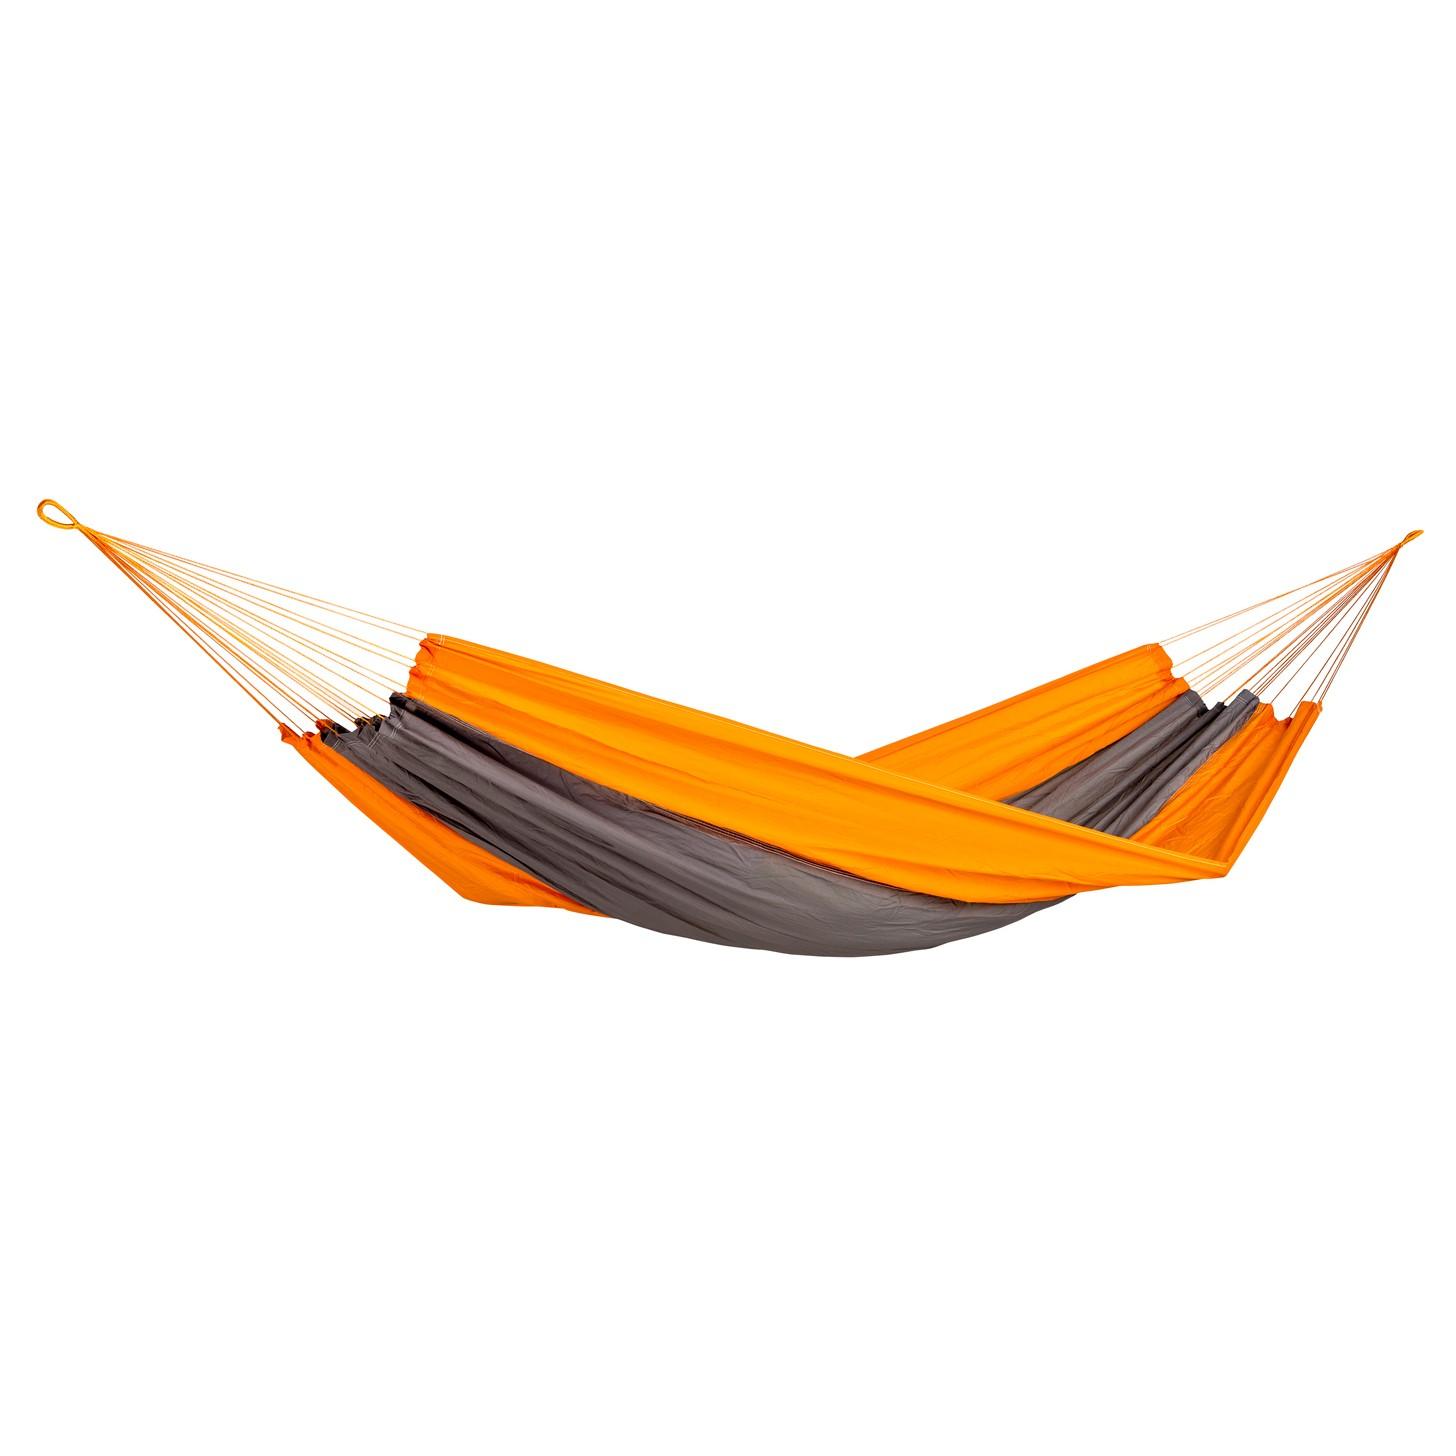 Hamac Traveller Techno, gri - portocaliu, 220 x 140 cm